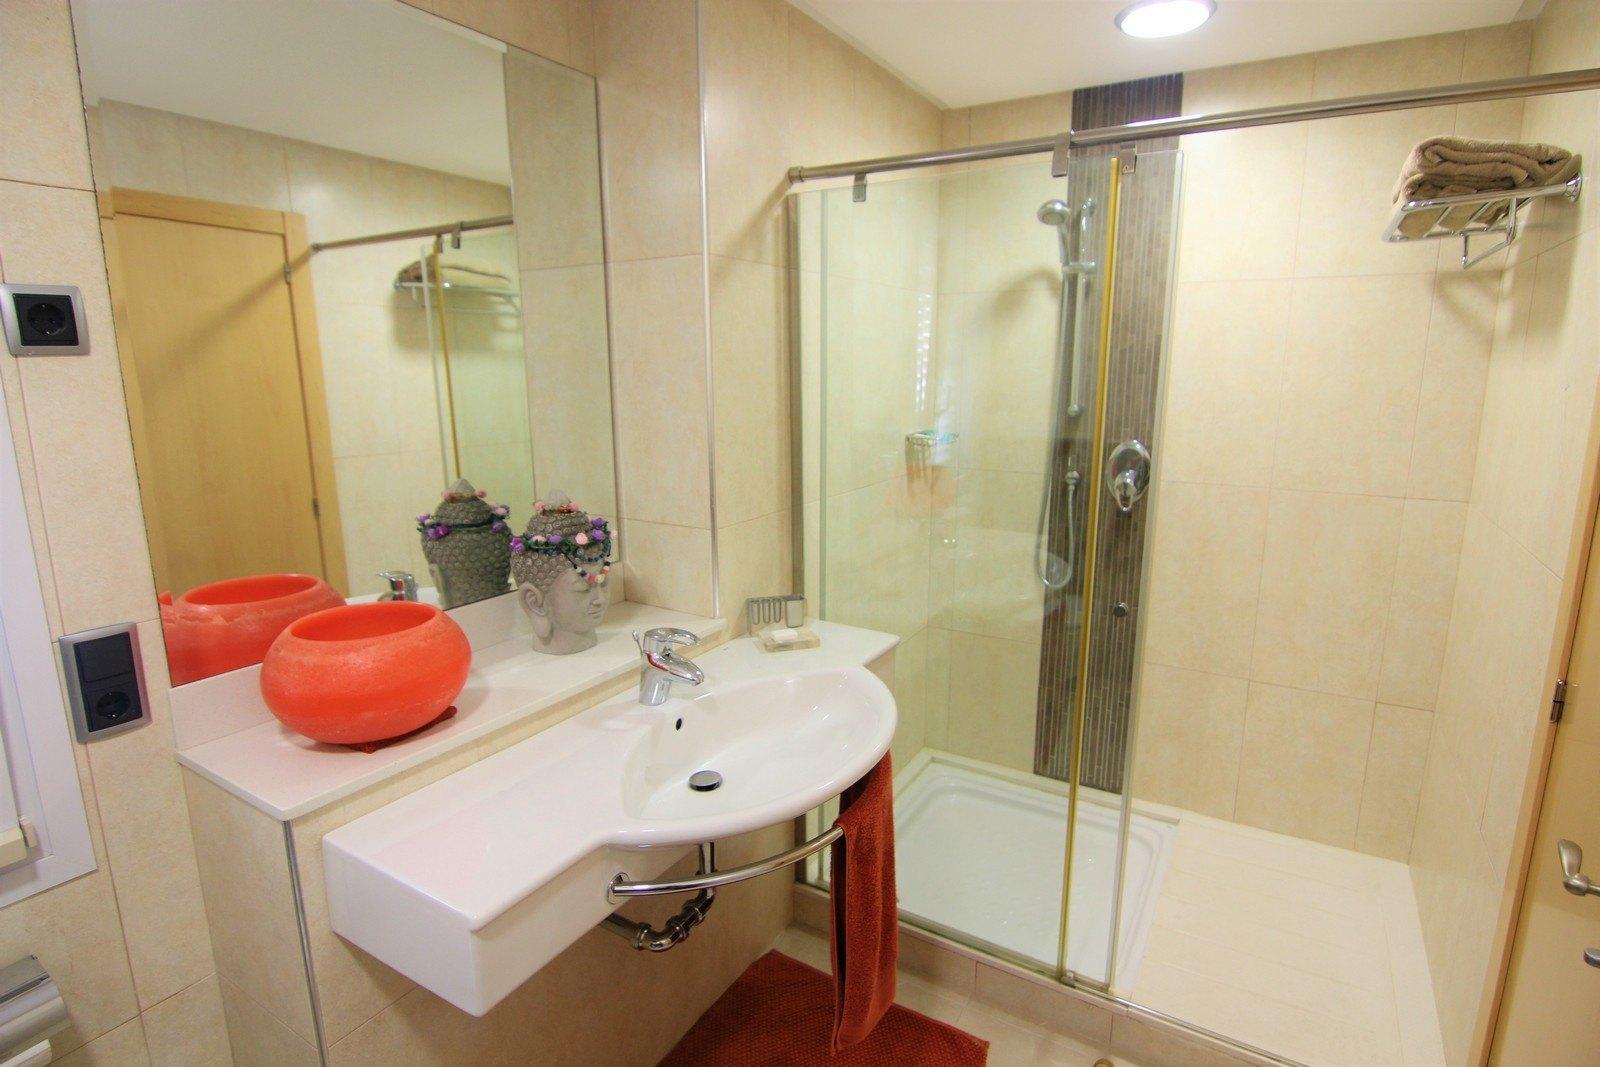 Appartement à vendre avec piscine à Calistros Benitatxell.